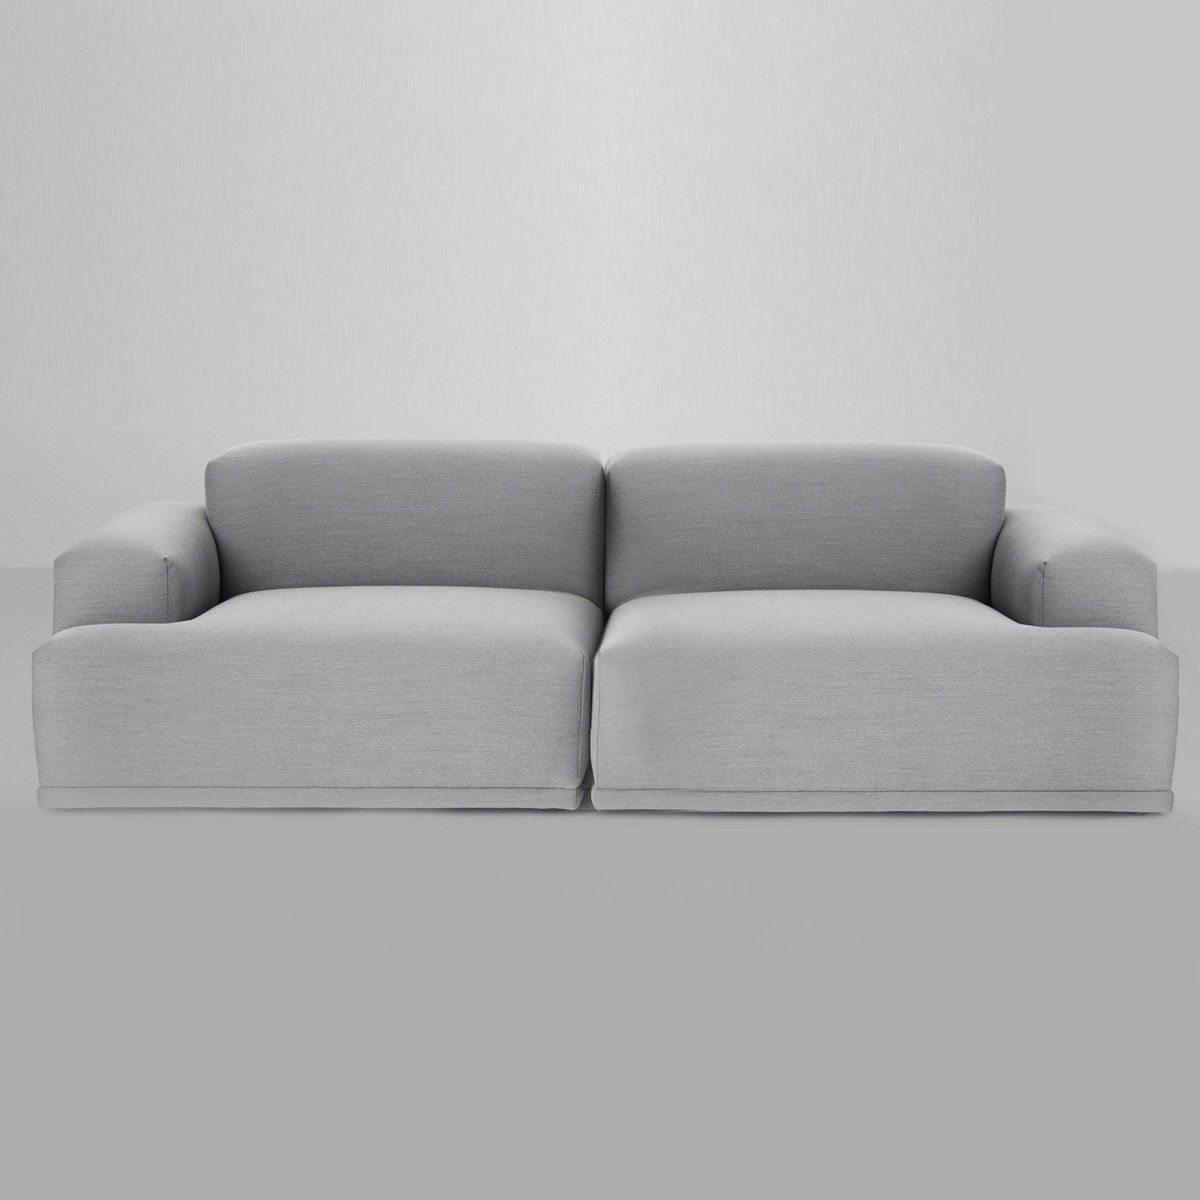 Connect lounge 2 sitzer sofa muuto sofas sitzm bel for Lounge mobel 2 sitzer